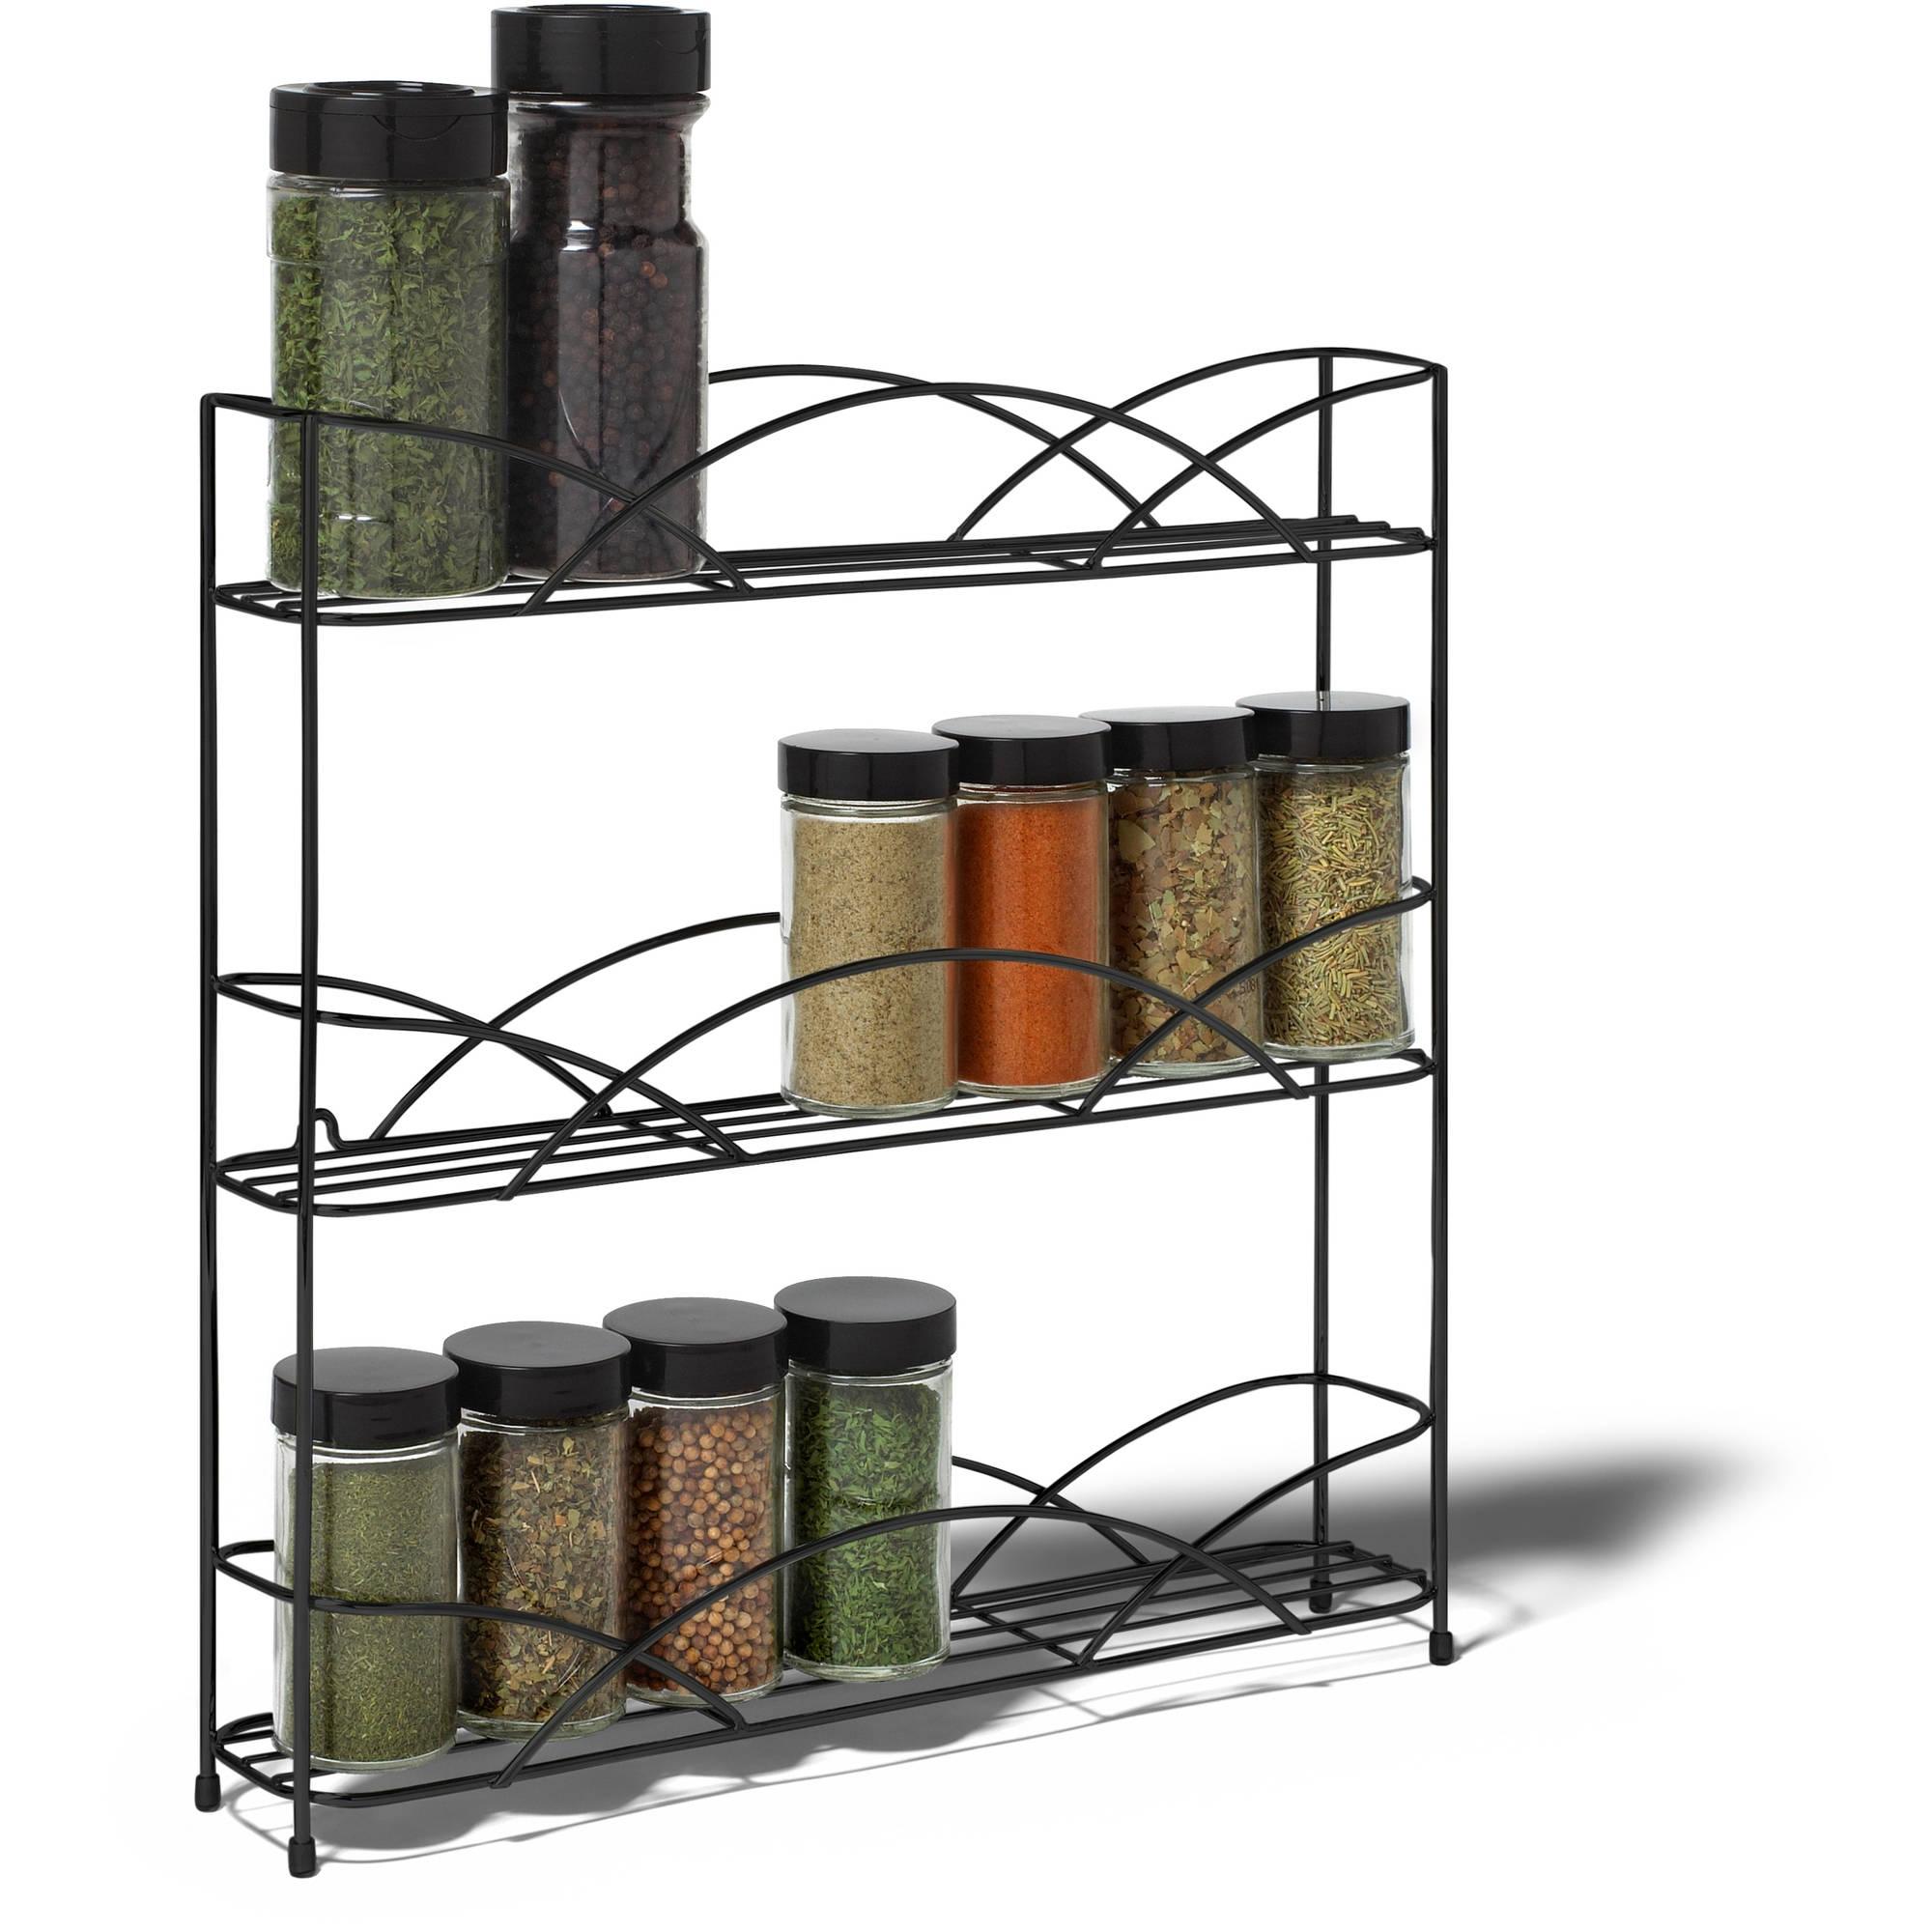 Wall Mounted Spice Rack spectrum diversified designs countertop 3-tier spice rack, black